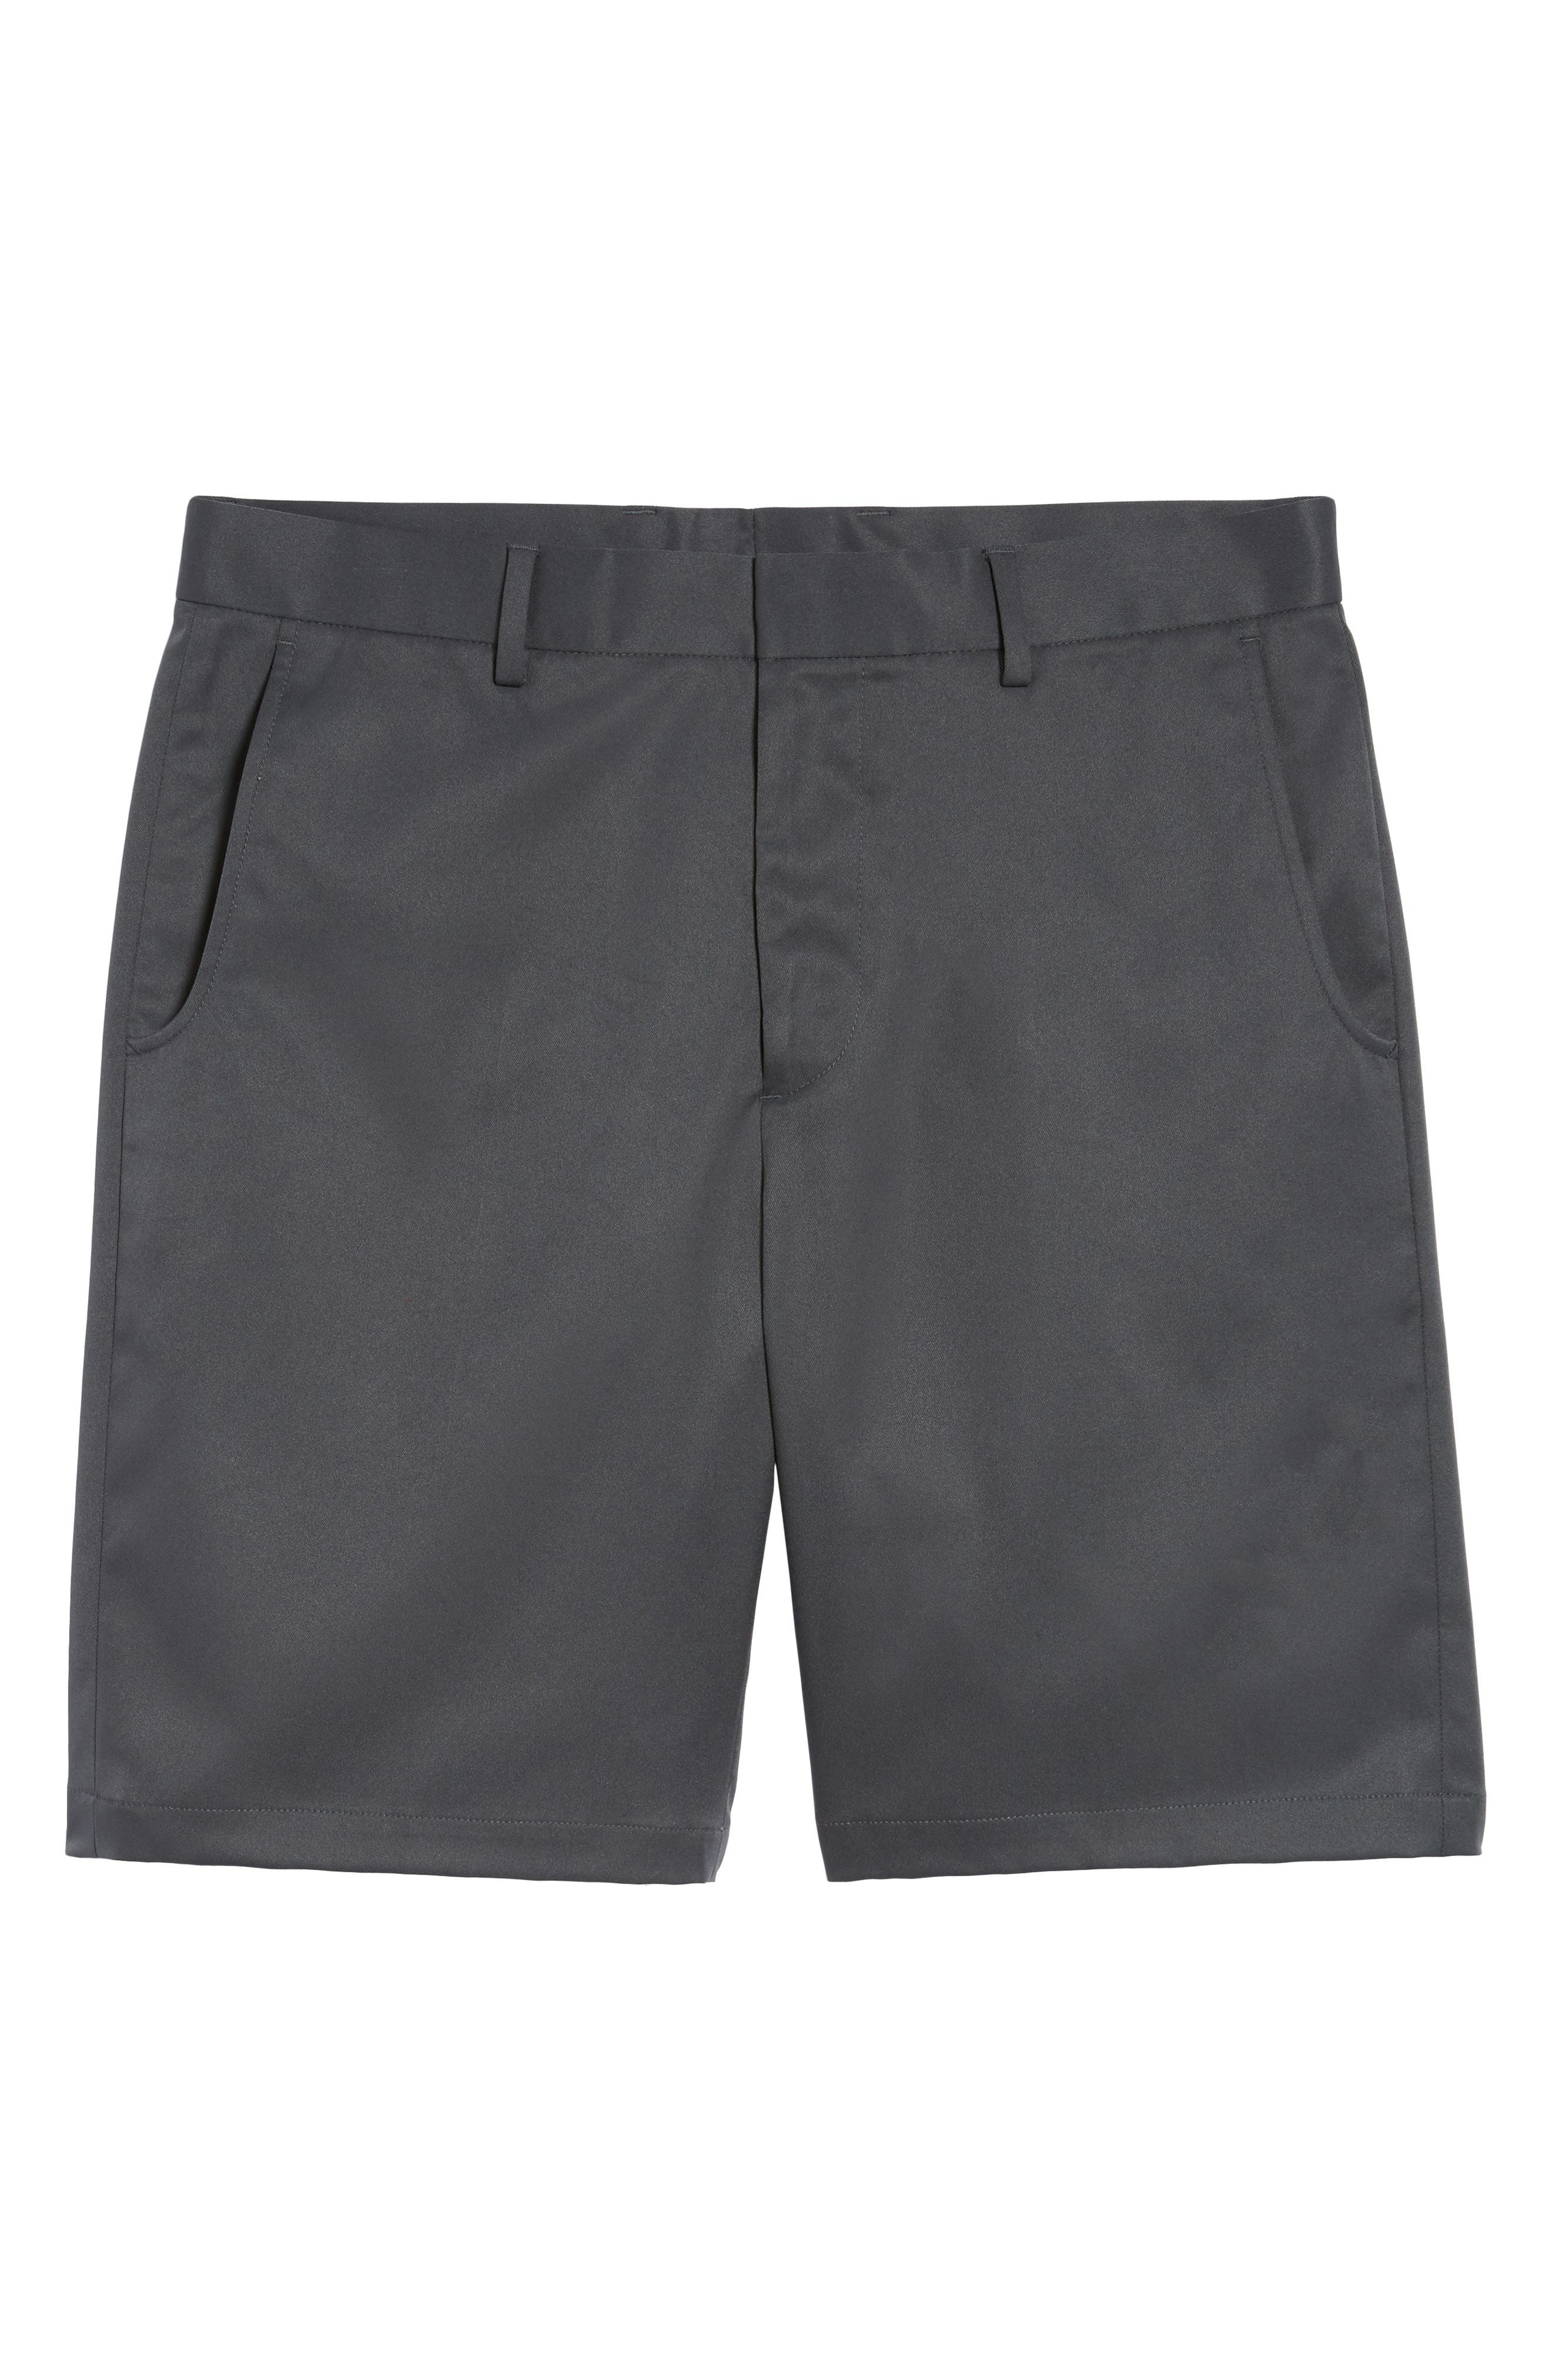 Flat Front Tech Shorts,                             Alternate thumbnail 6, color,                             CHARCOAL